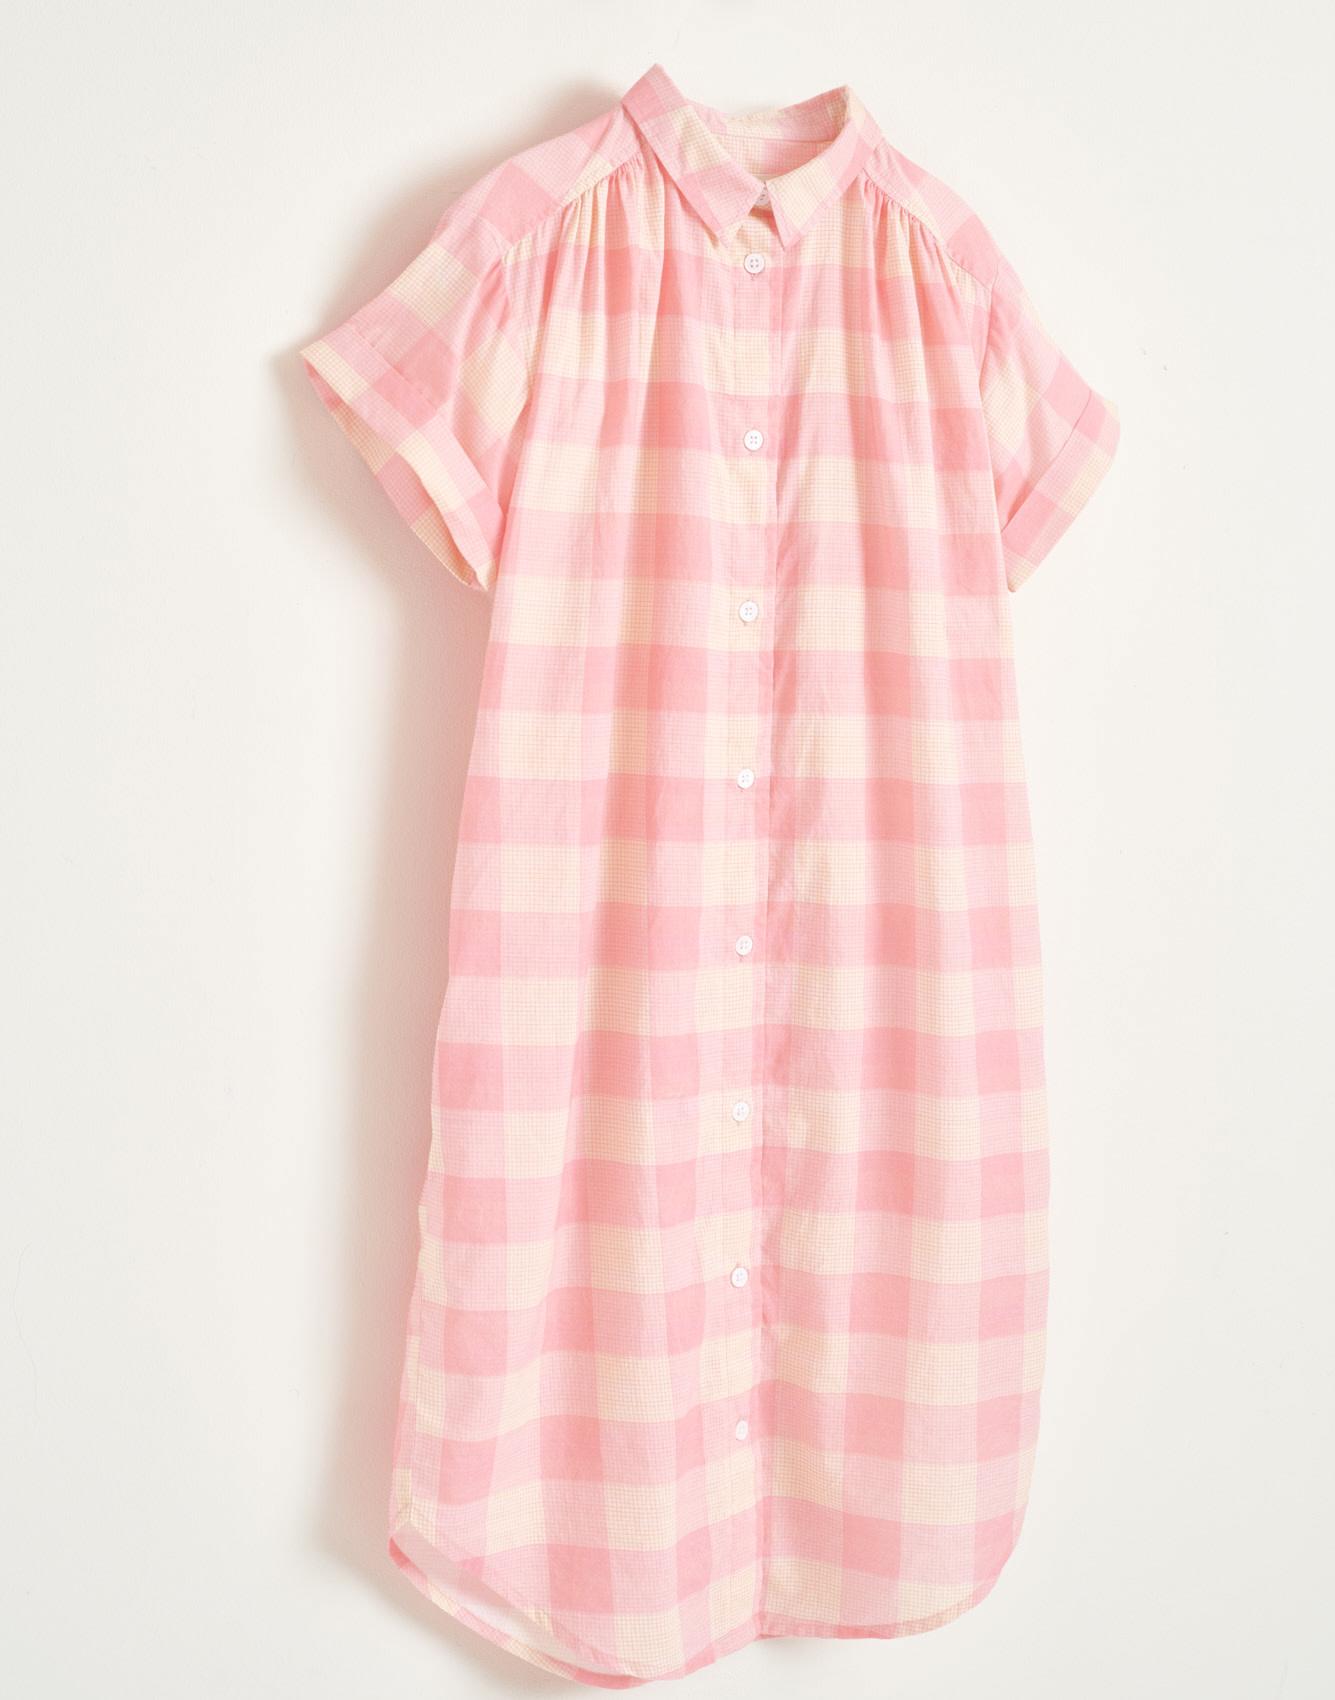 Angie dress check-3